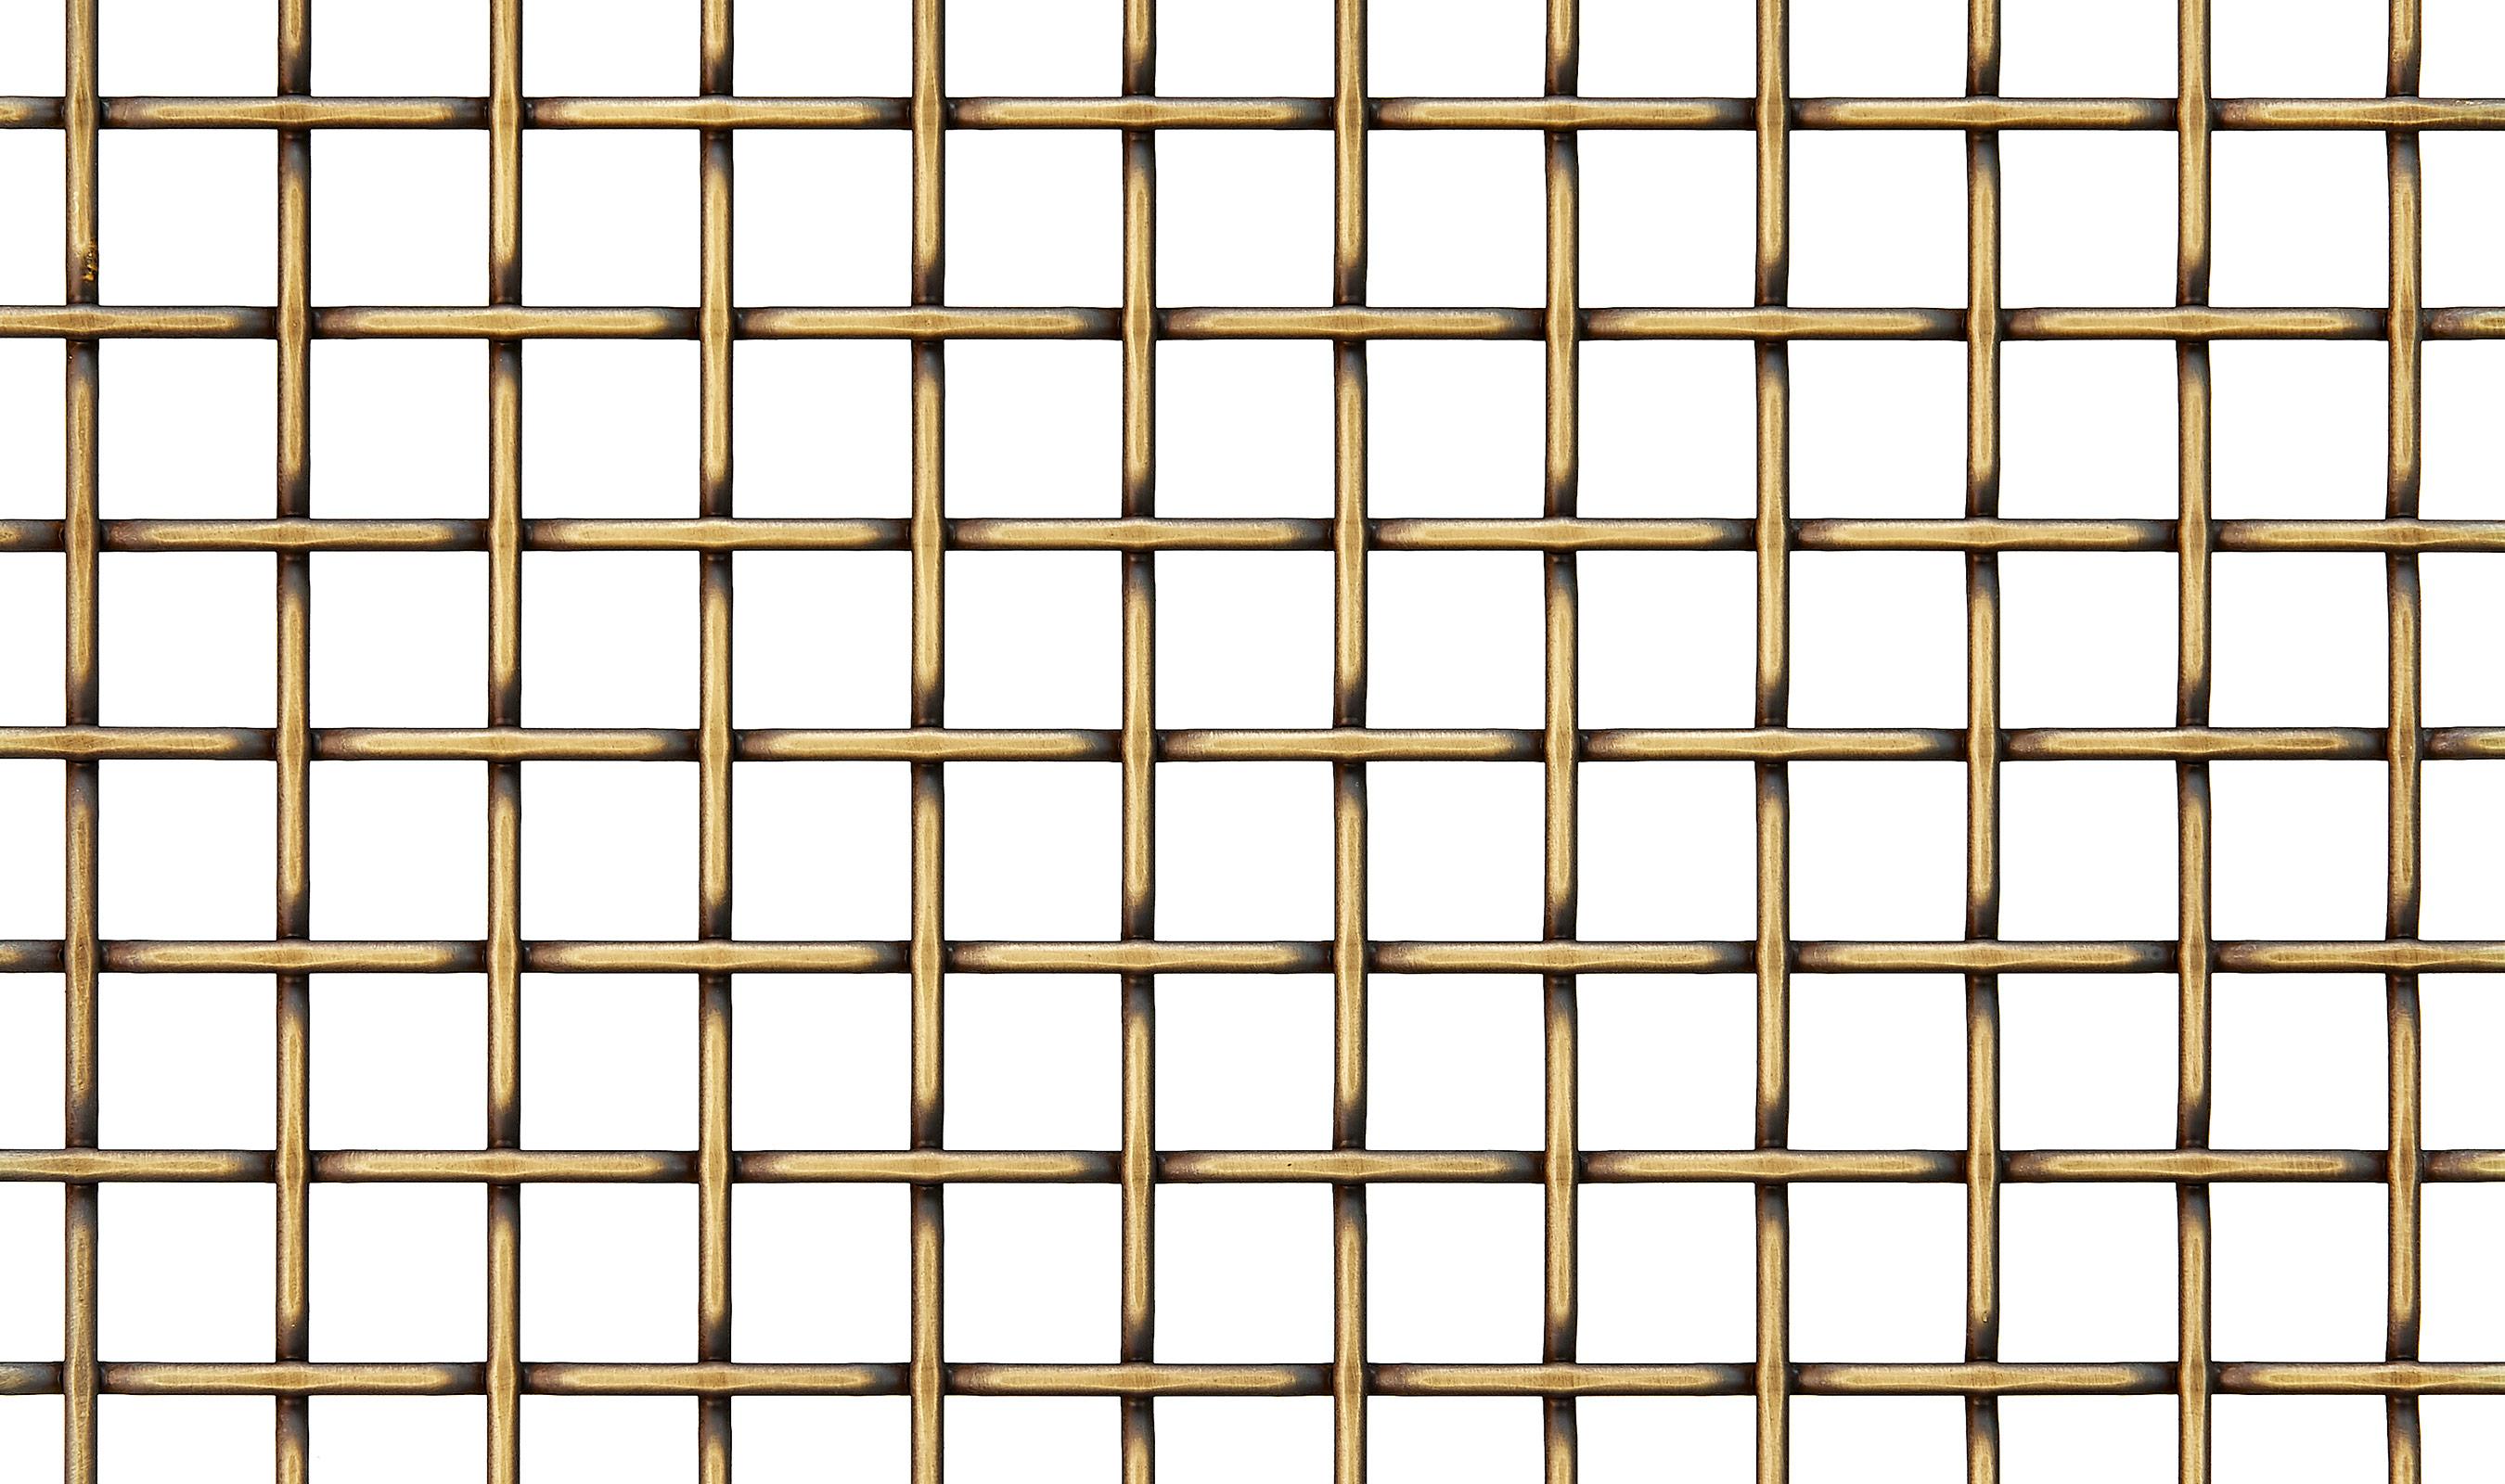 F-48 wire mesh Antique Brass decorative plating finish